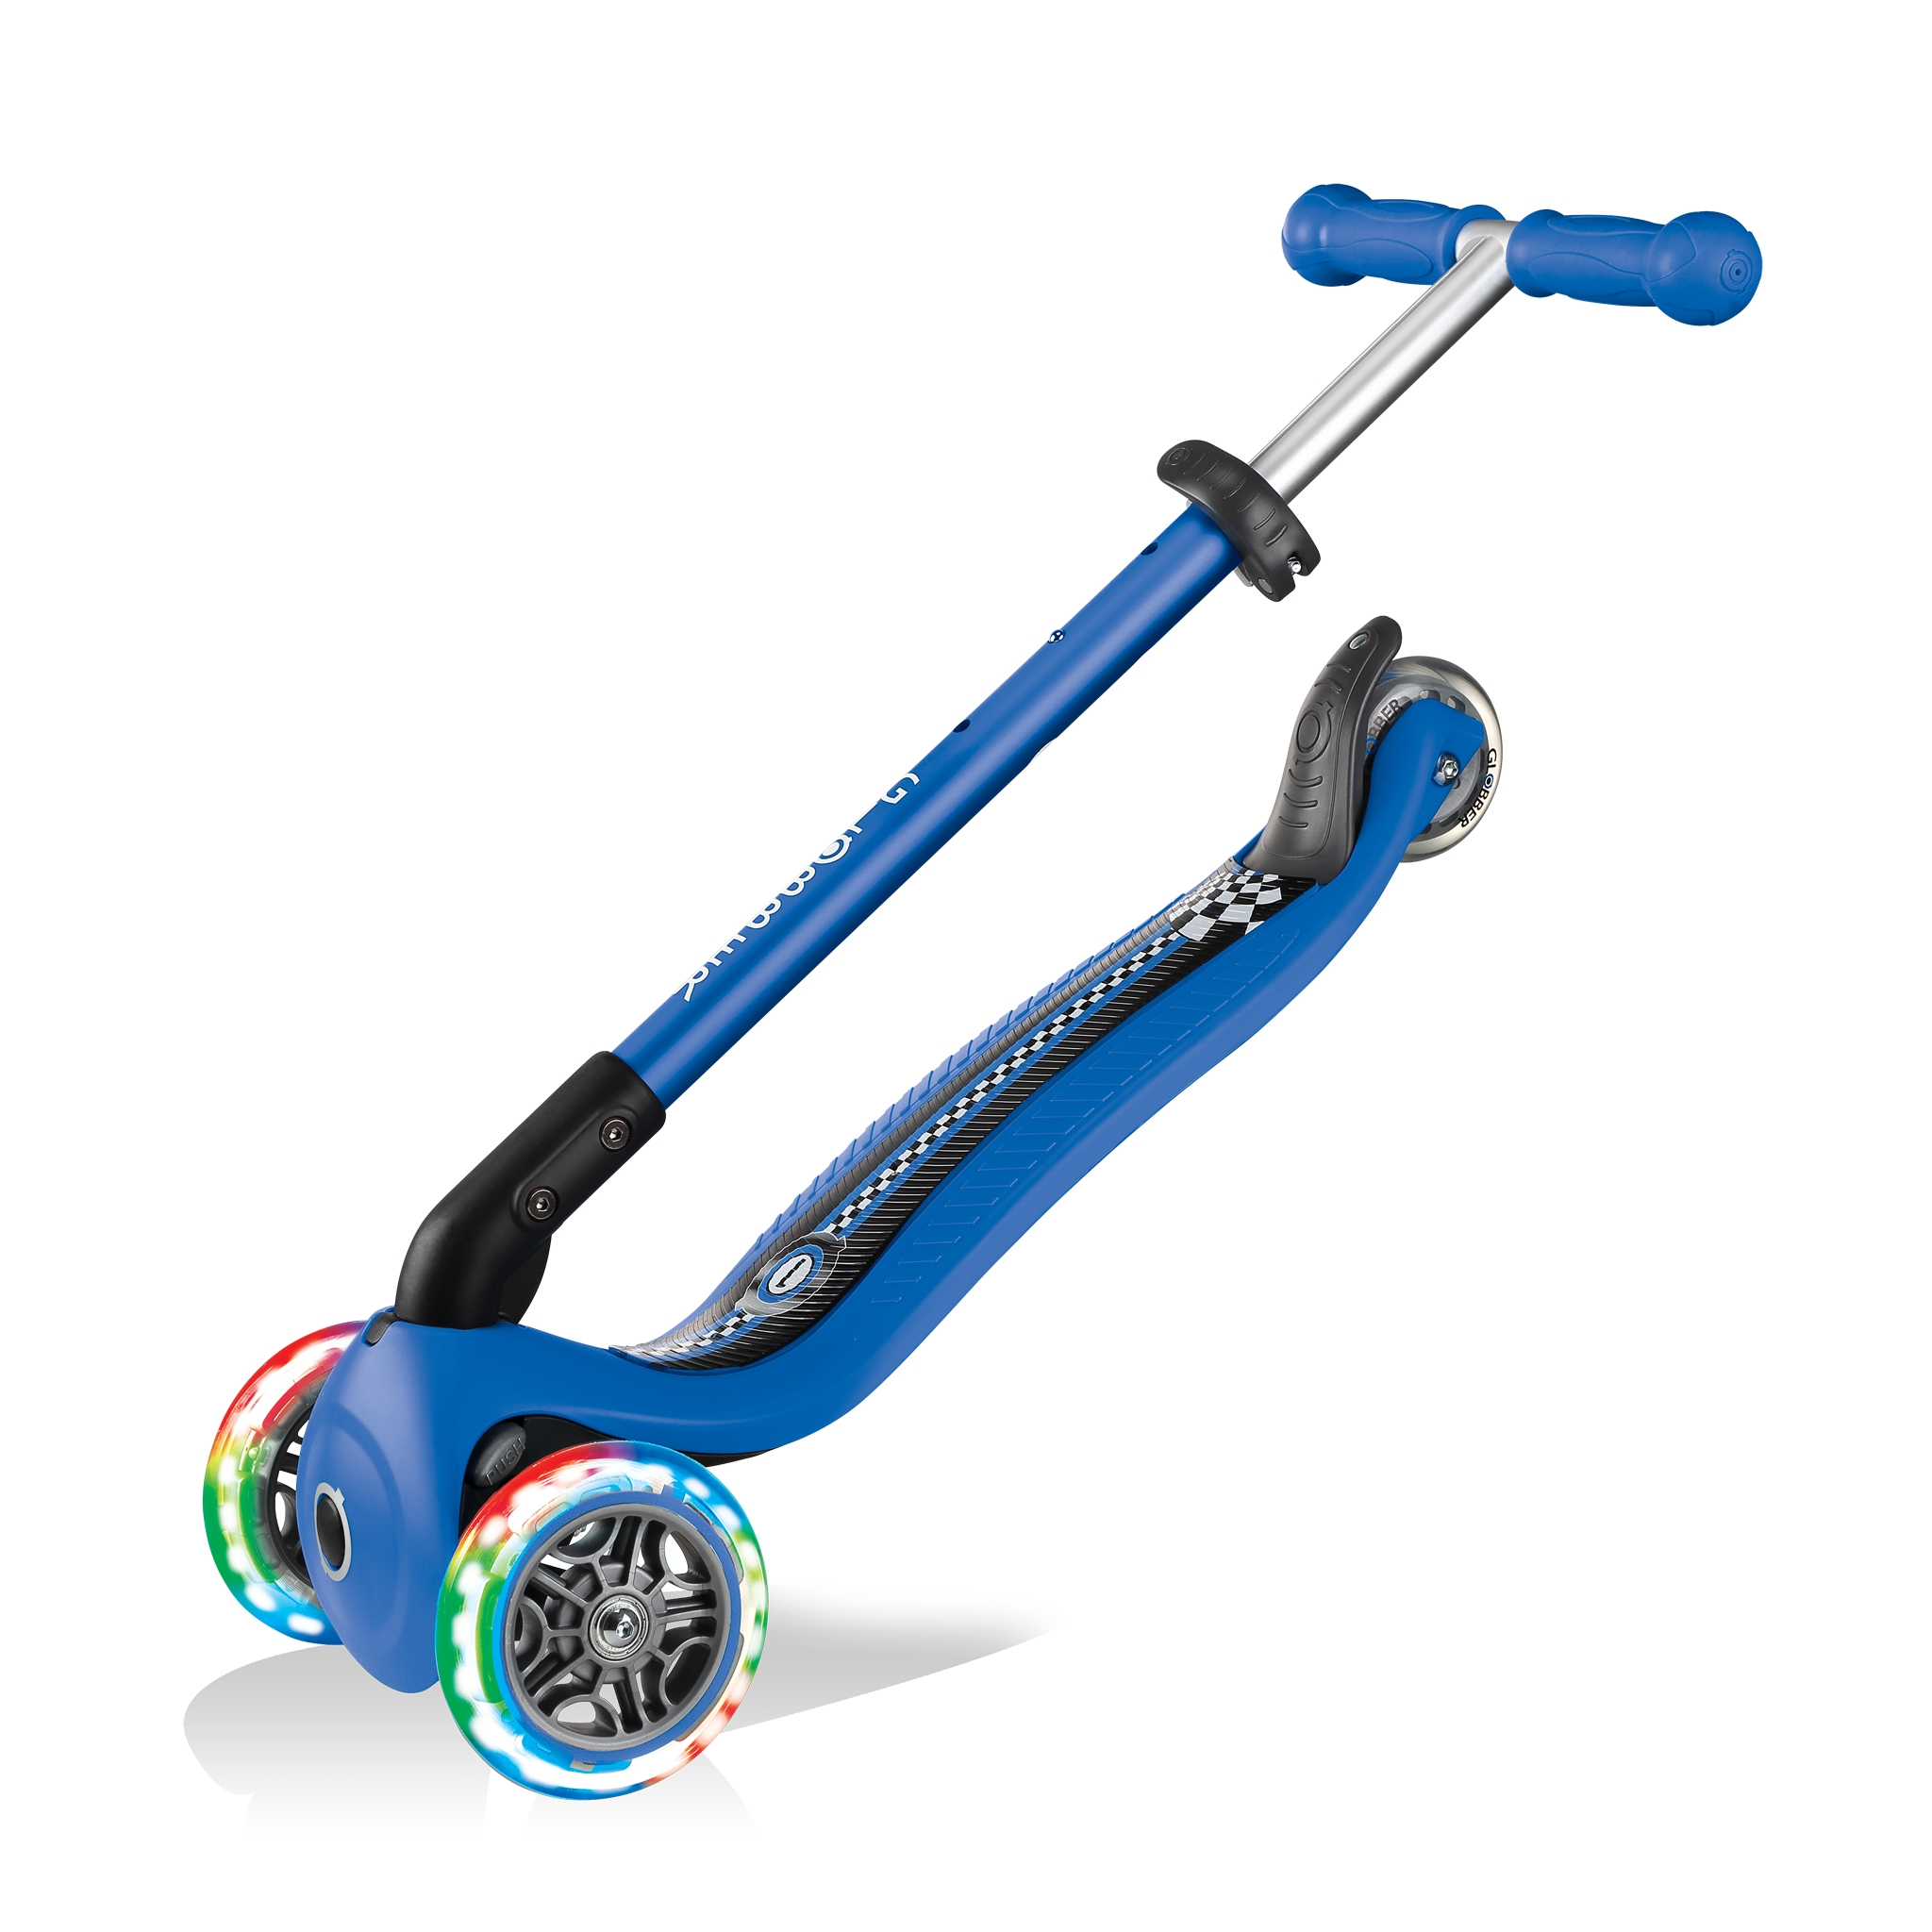 primo-foldable-fantasy-lights-light-up-scooter-for-kids-trolley-mode 5